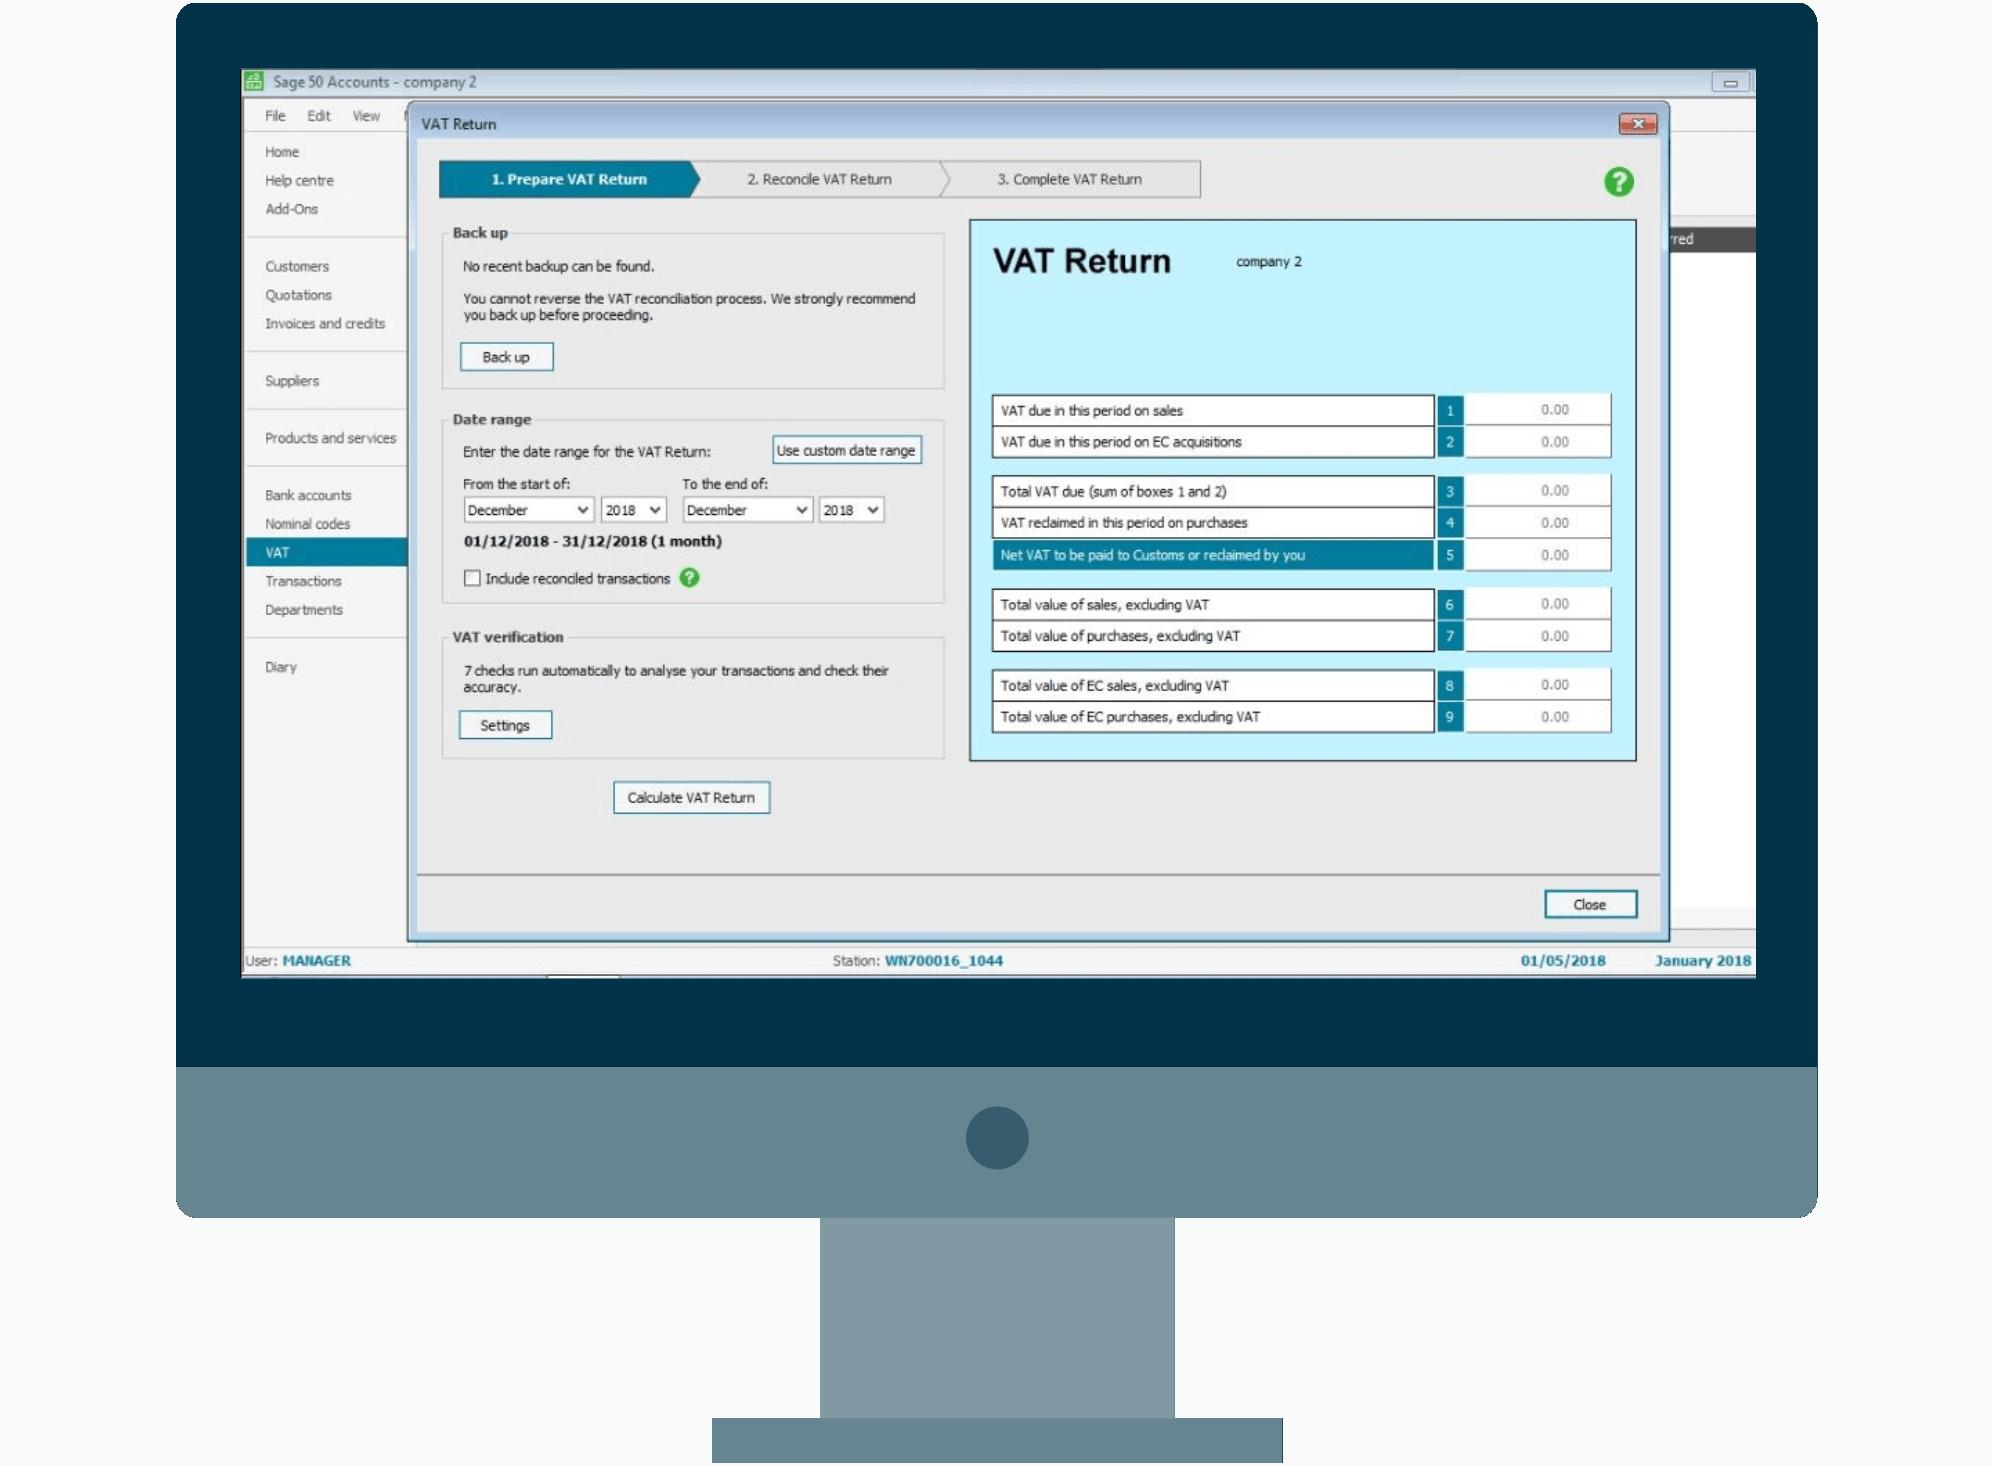 VAT and MTD video